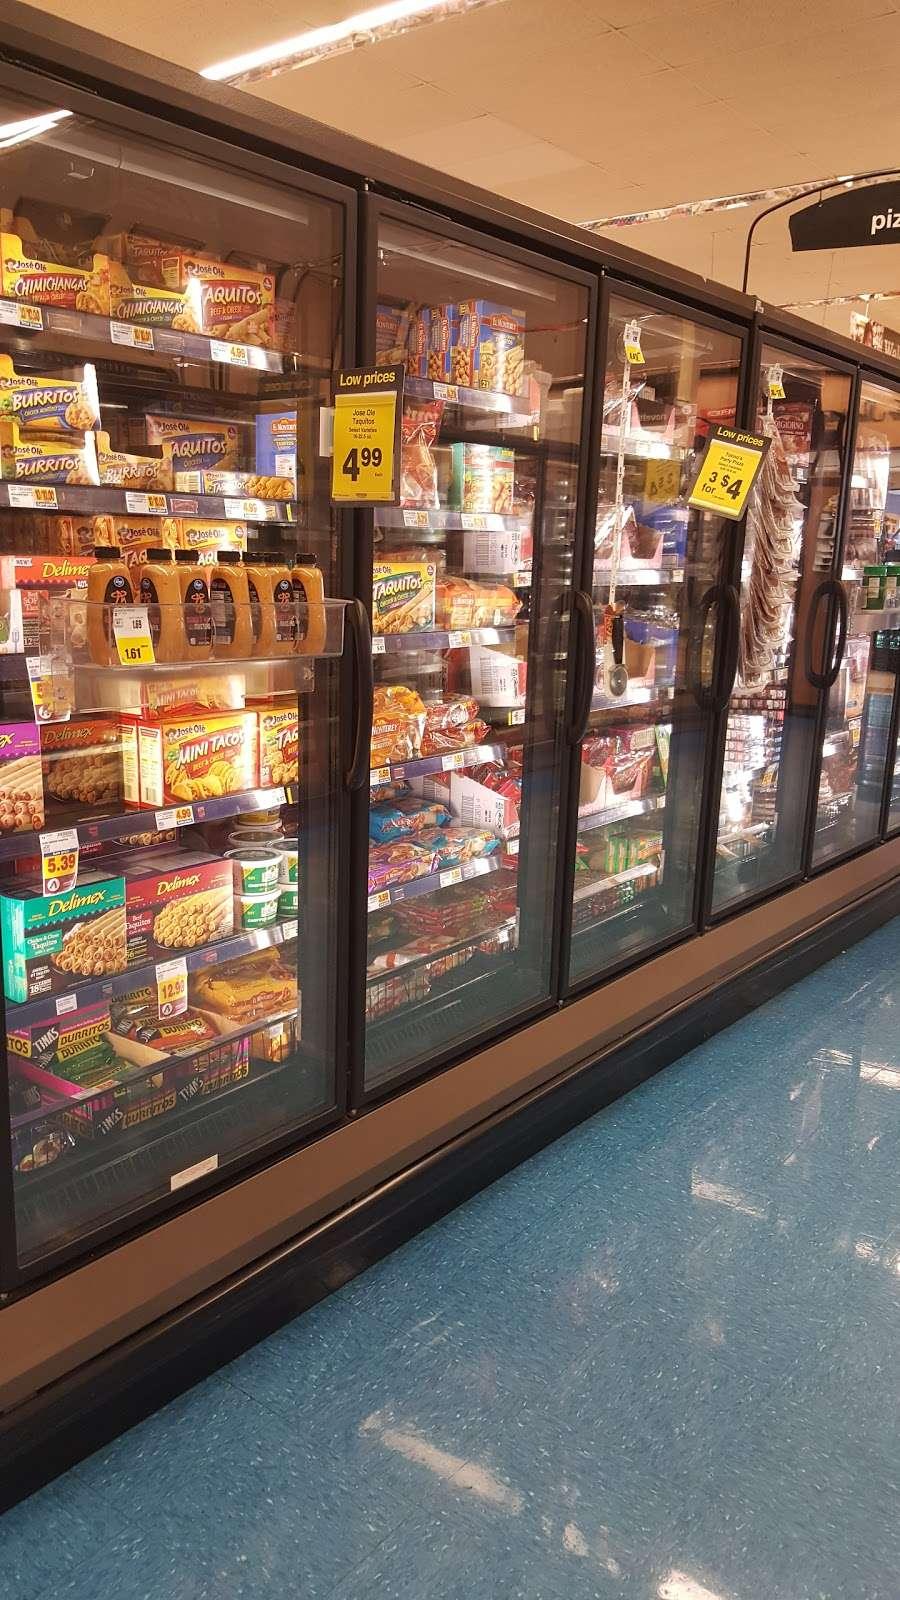 Frys Food And Drug - store  | Photo 4 of 9 | Address: 981 W Elliot Rd, Chandler, AZ 85225, USA | Phone: (480) 821-2296